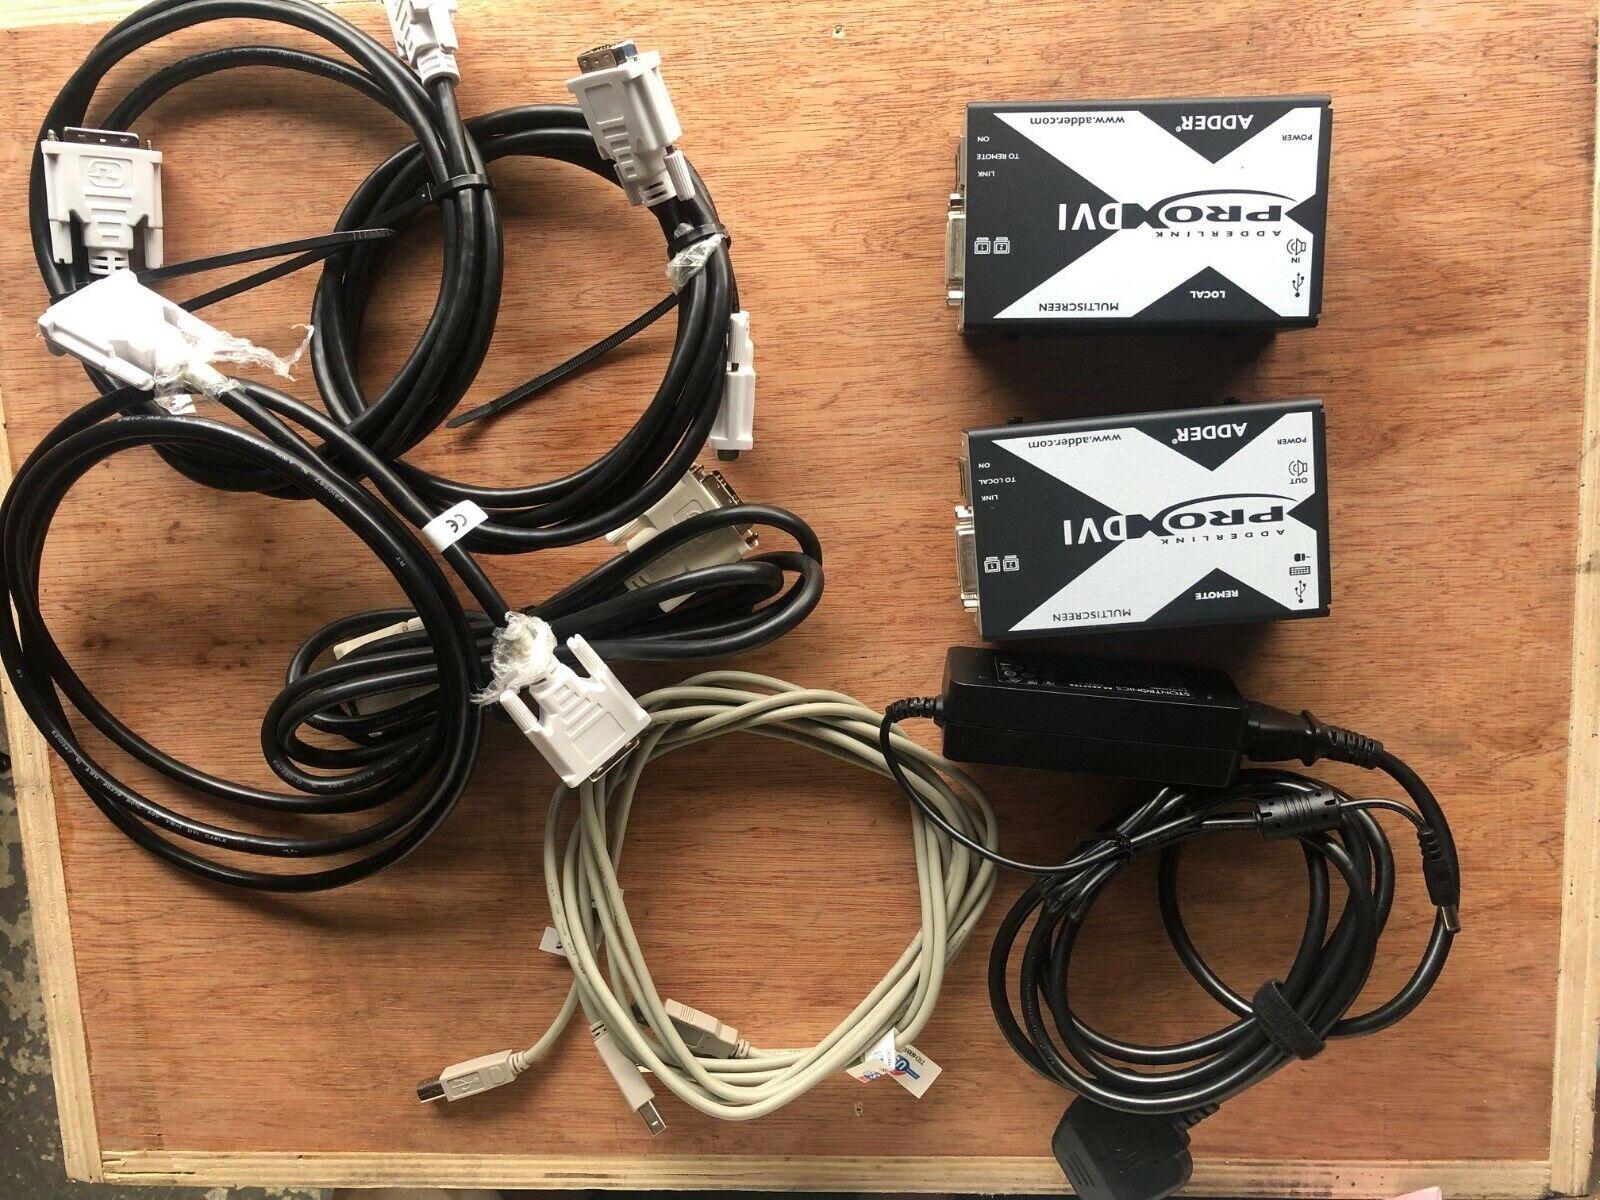 X-DVIPRO-MS2: AdderLink Dual Head DVI, USB and Audio Extender